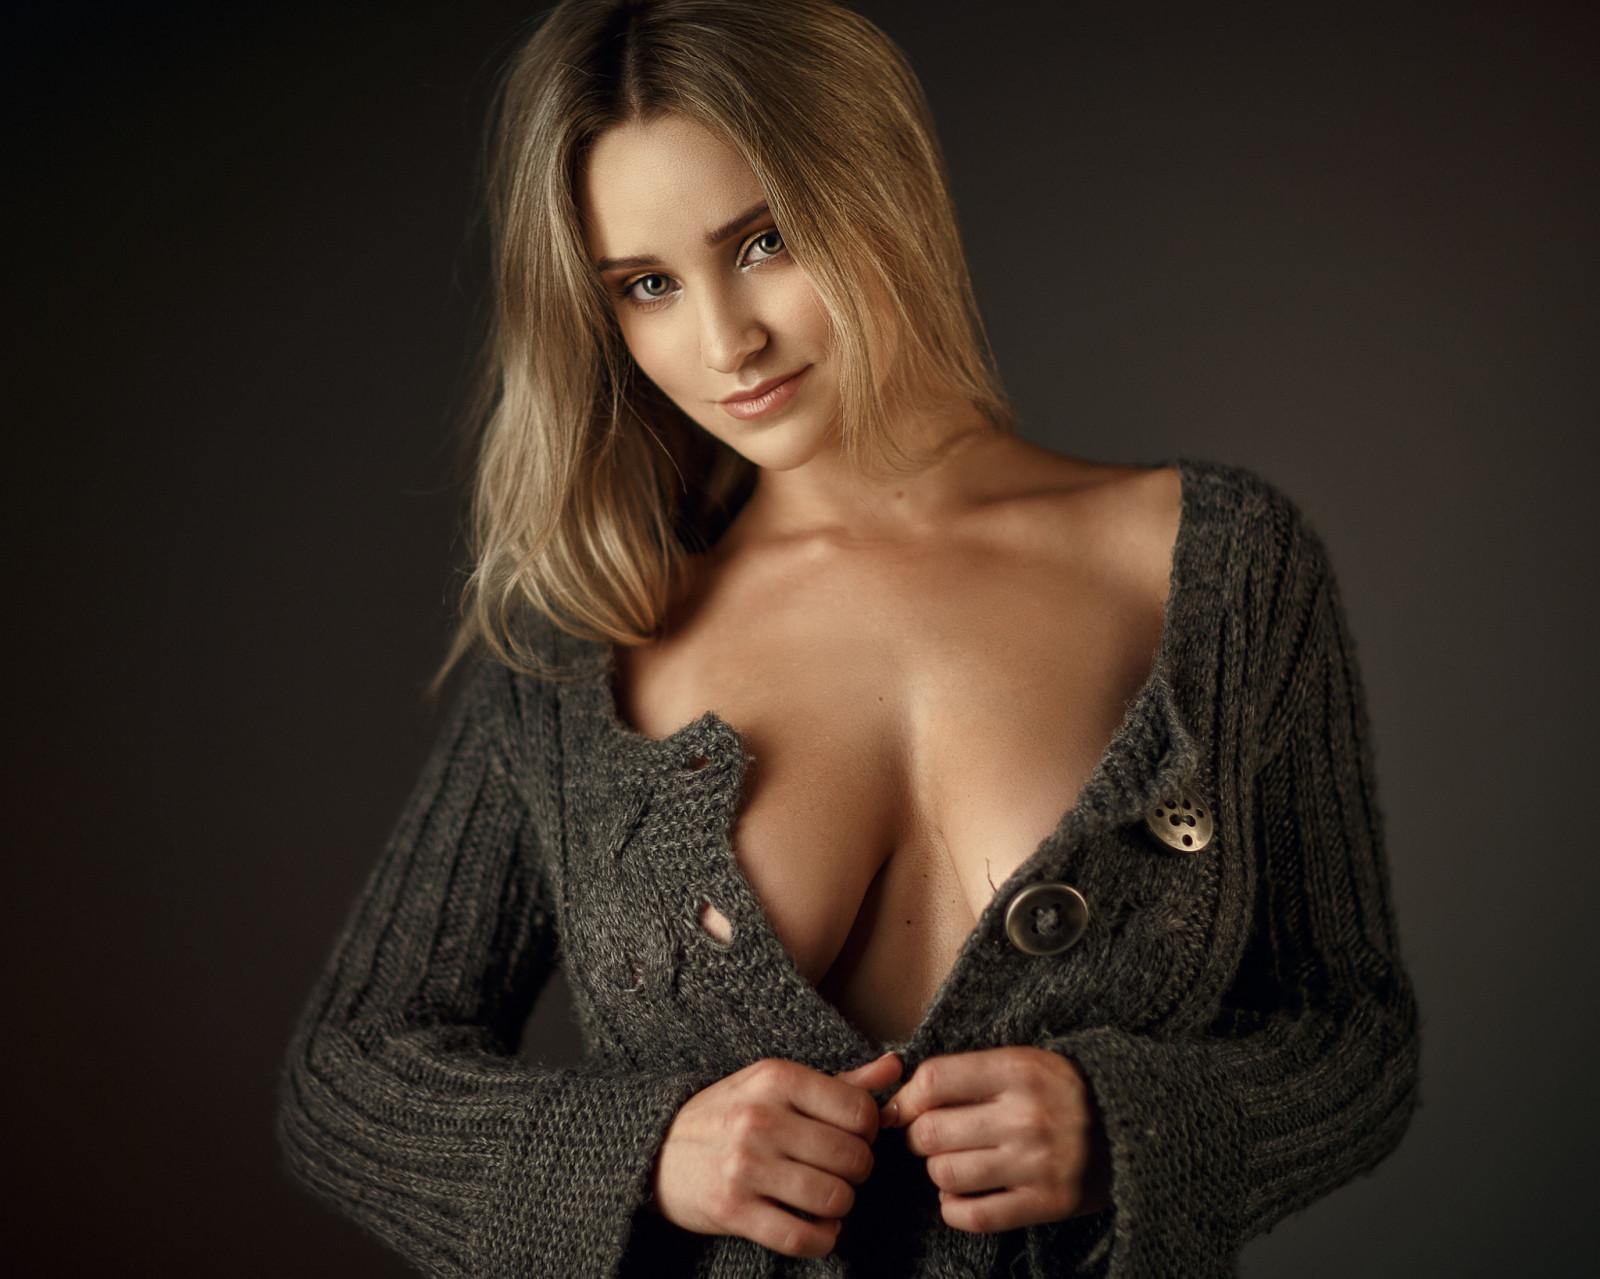 Wallpaper : model, blonde, long hair, looking at viewer